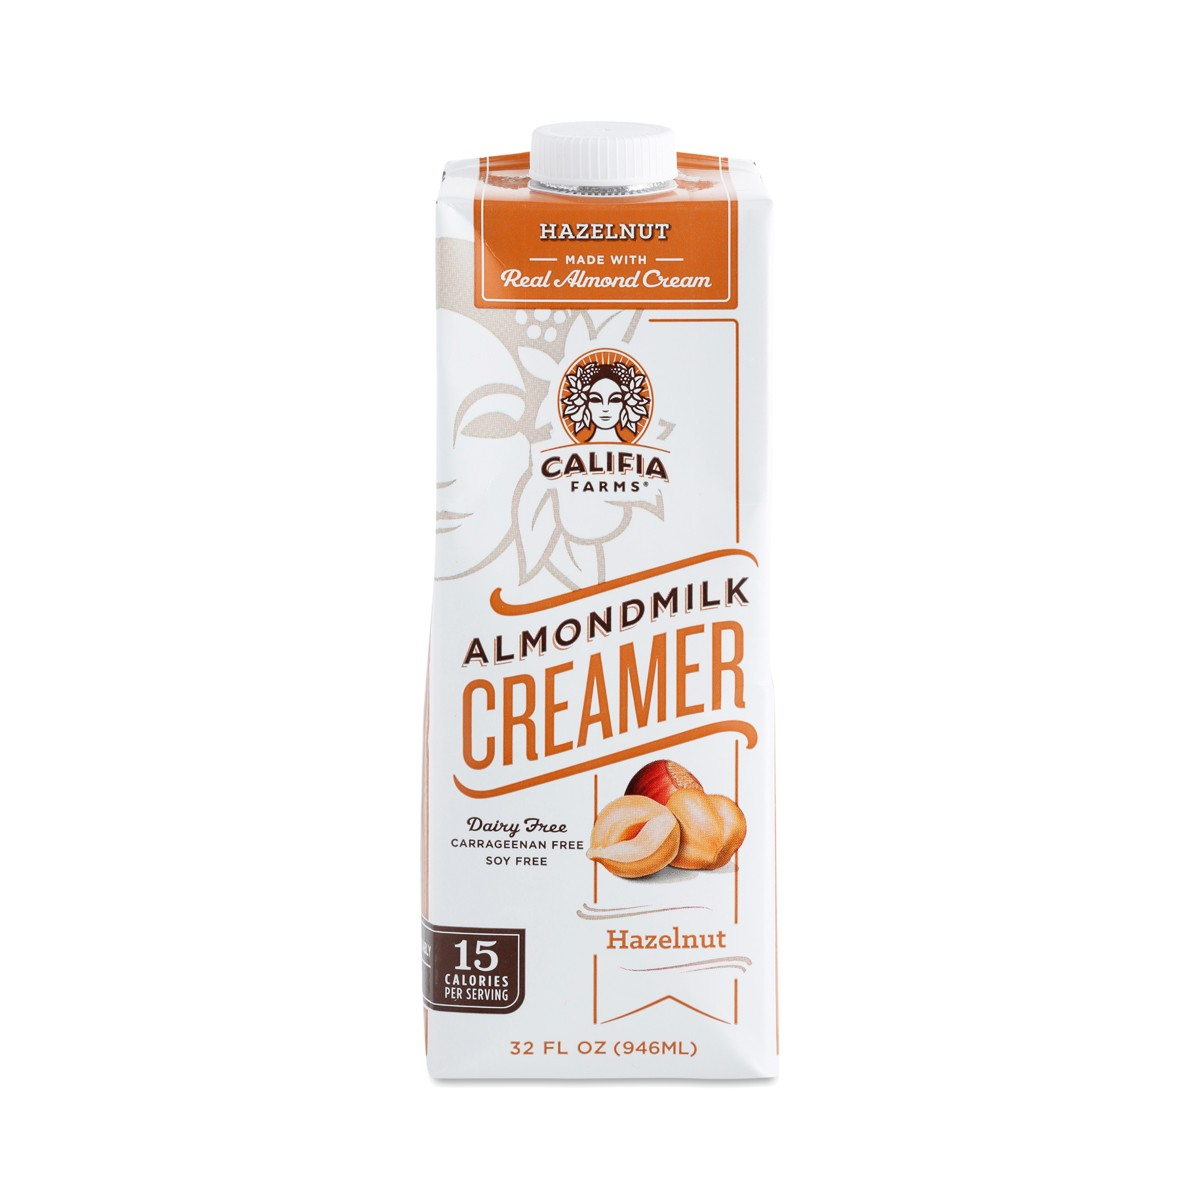 Califia Farms Almond Milk Creamer, Hazelnut - Thrive Market